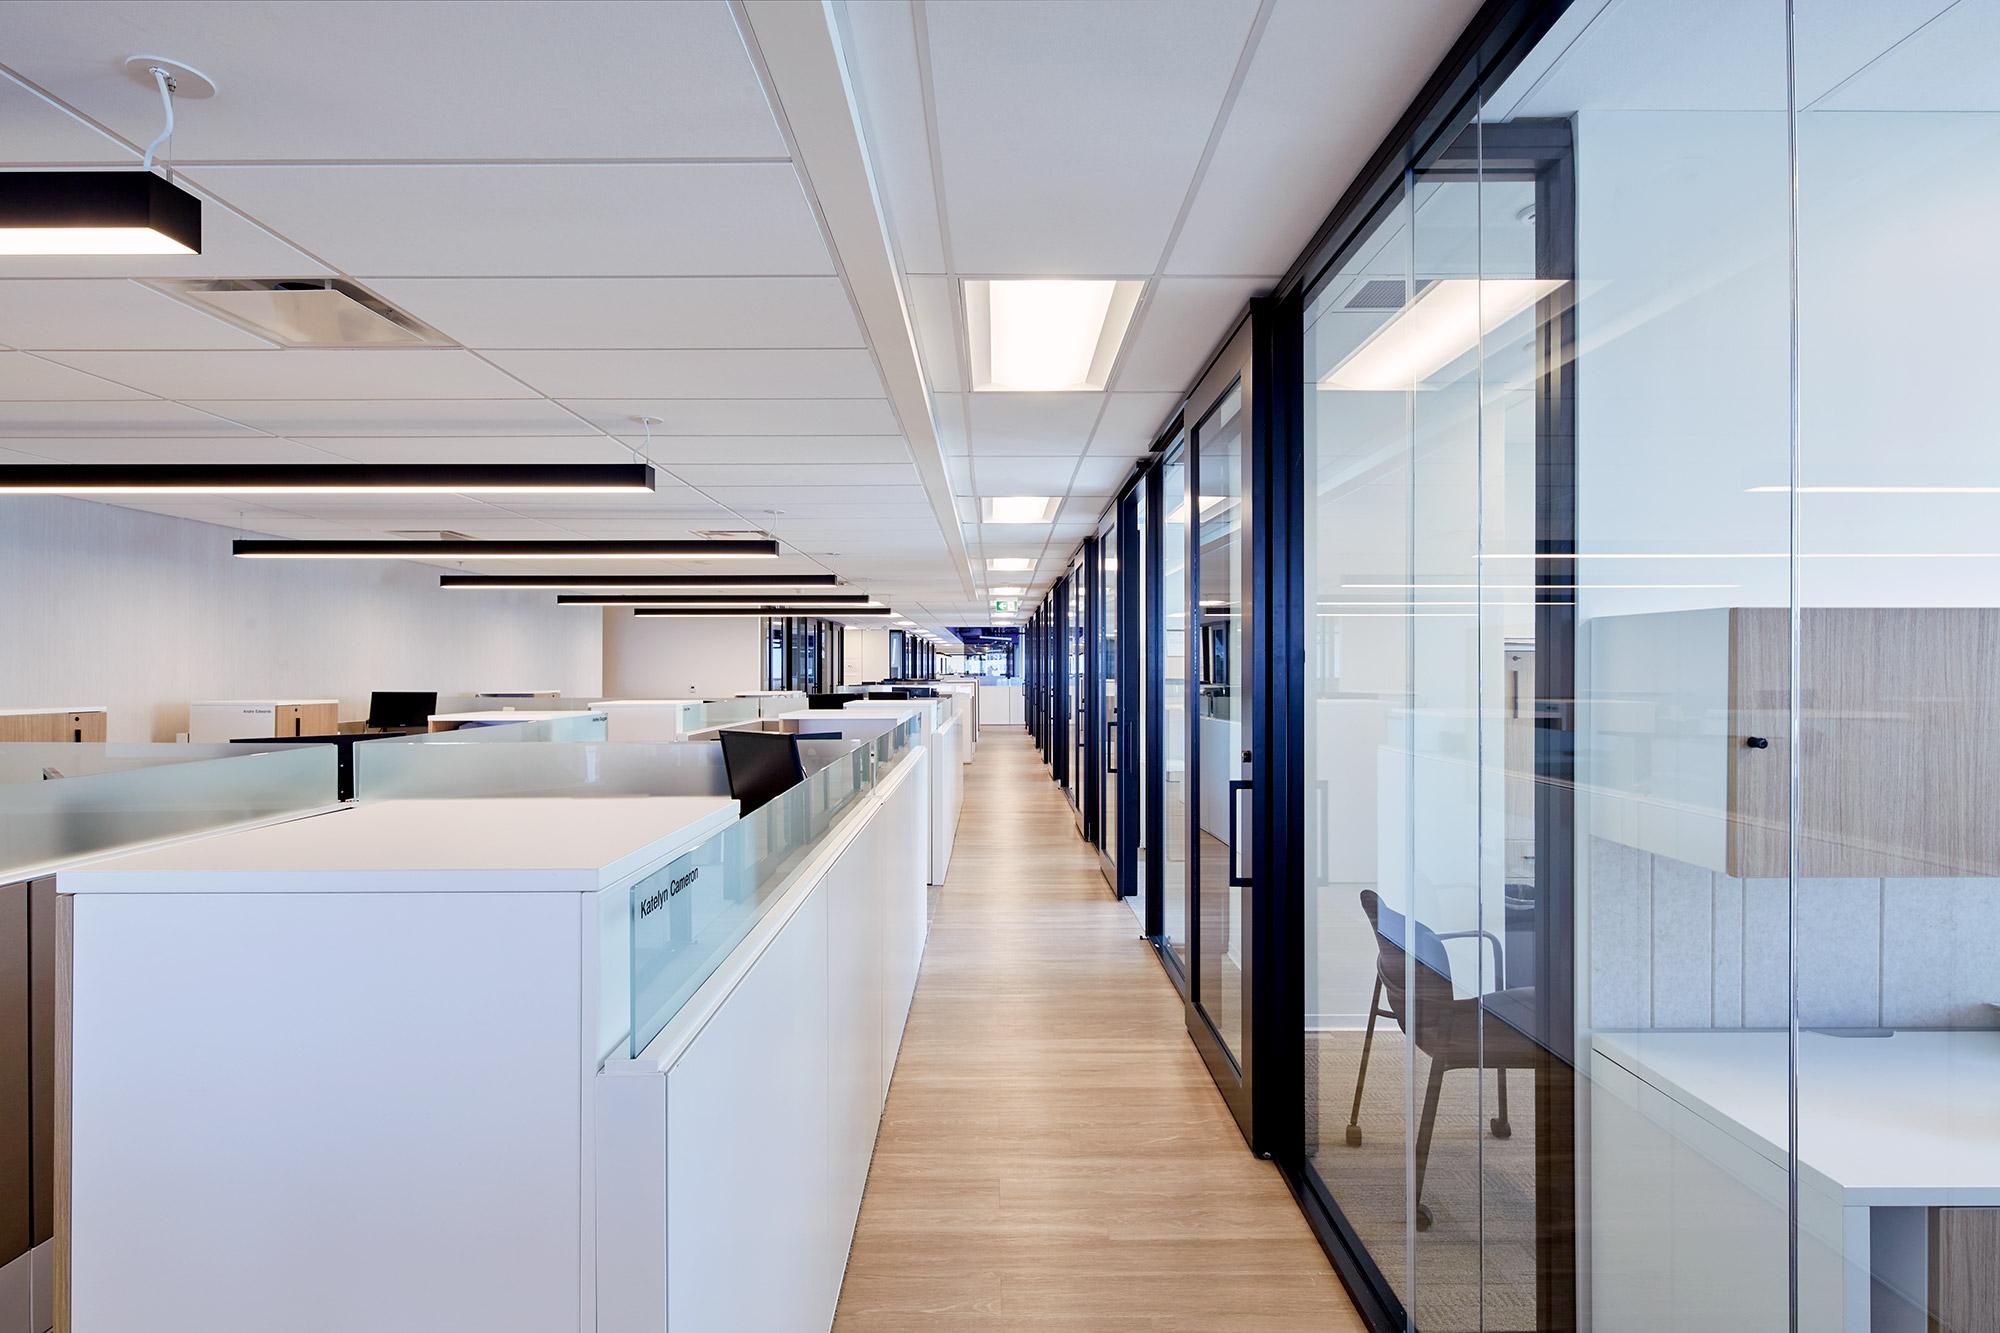 interior-design-law-office-space.jpg